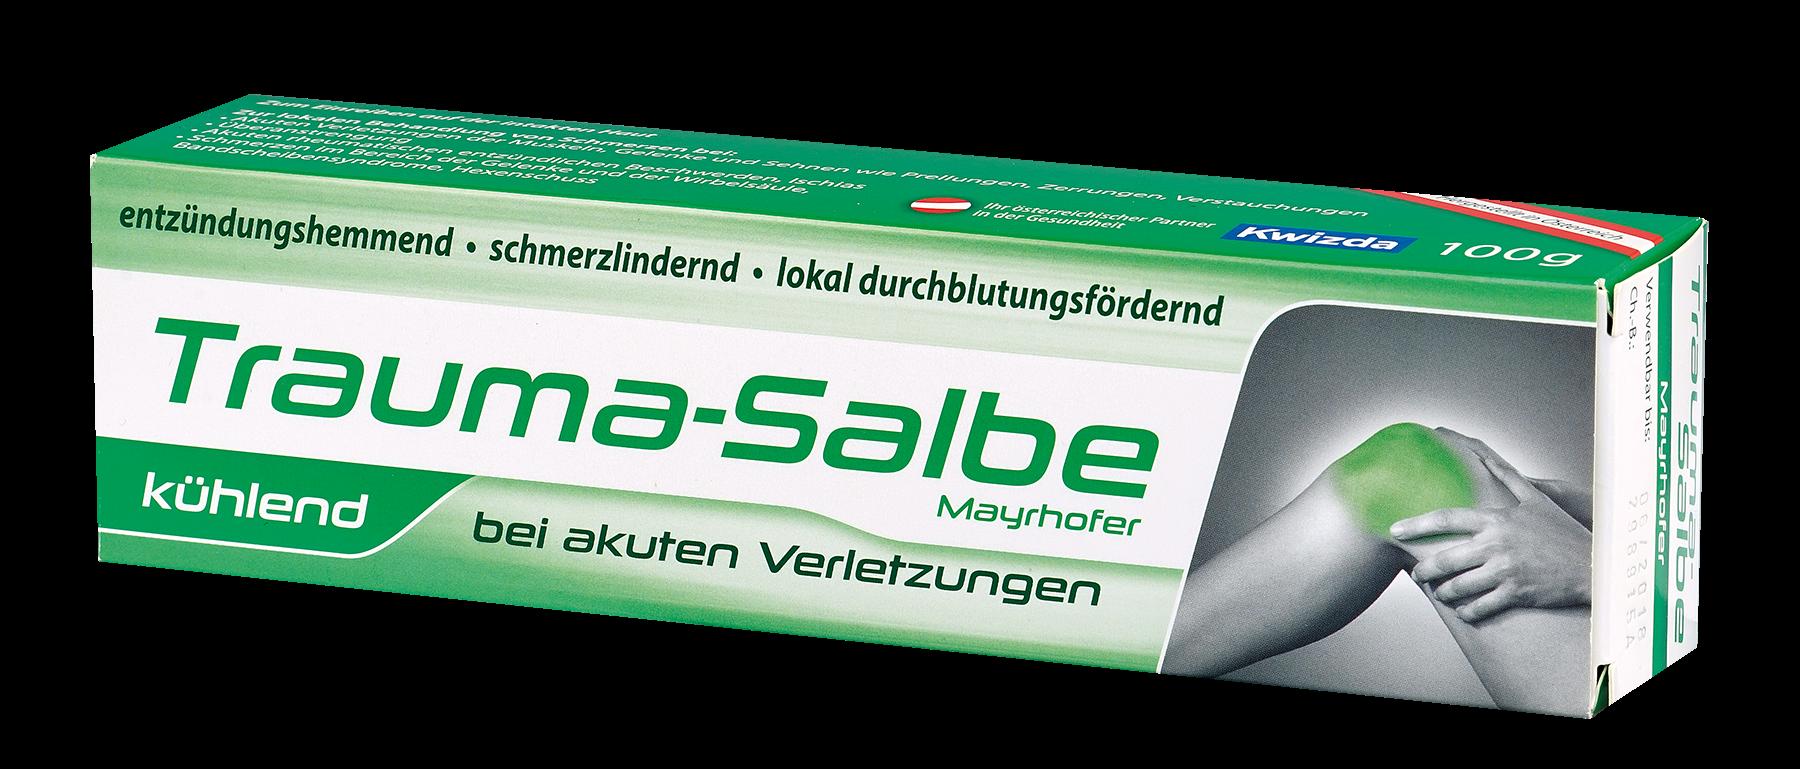 Trauma - Salbe kühlend Mayrhofer